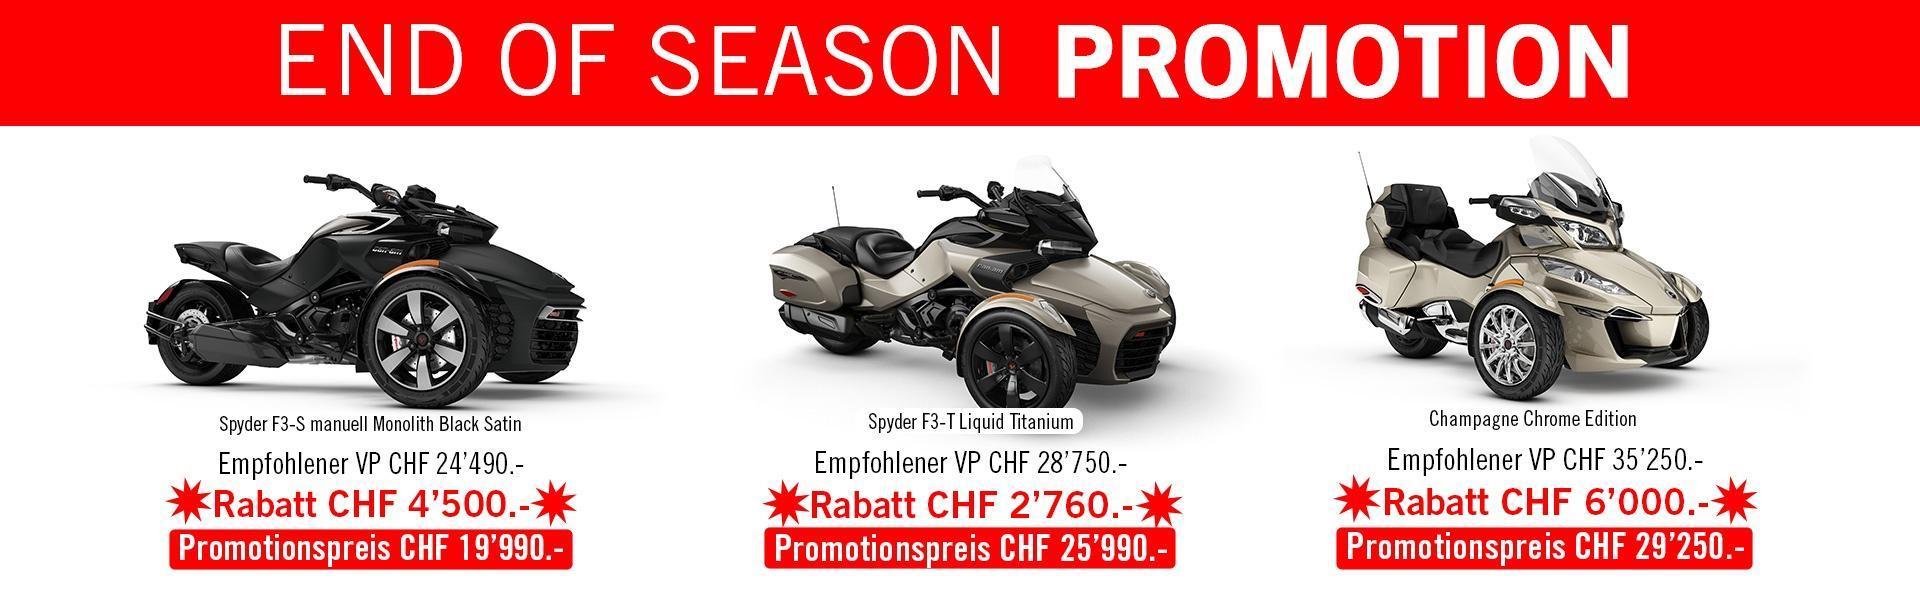 end-of-season-promotion-slide